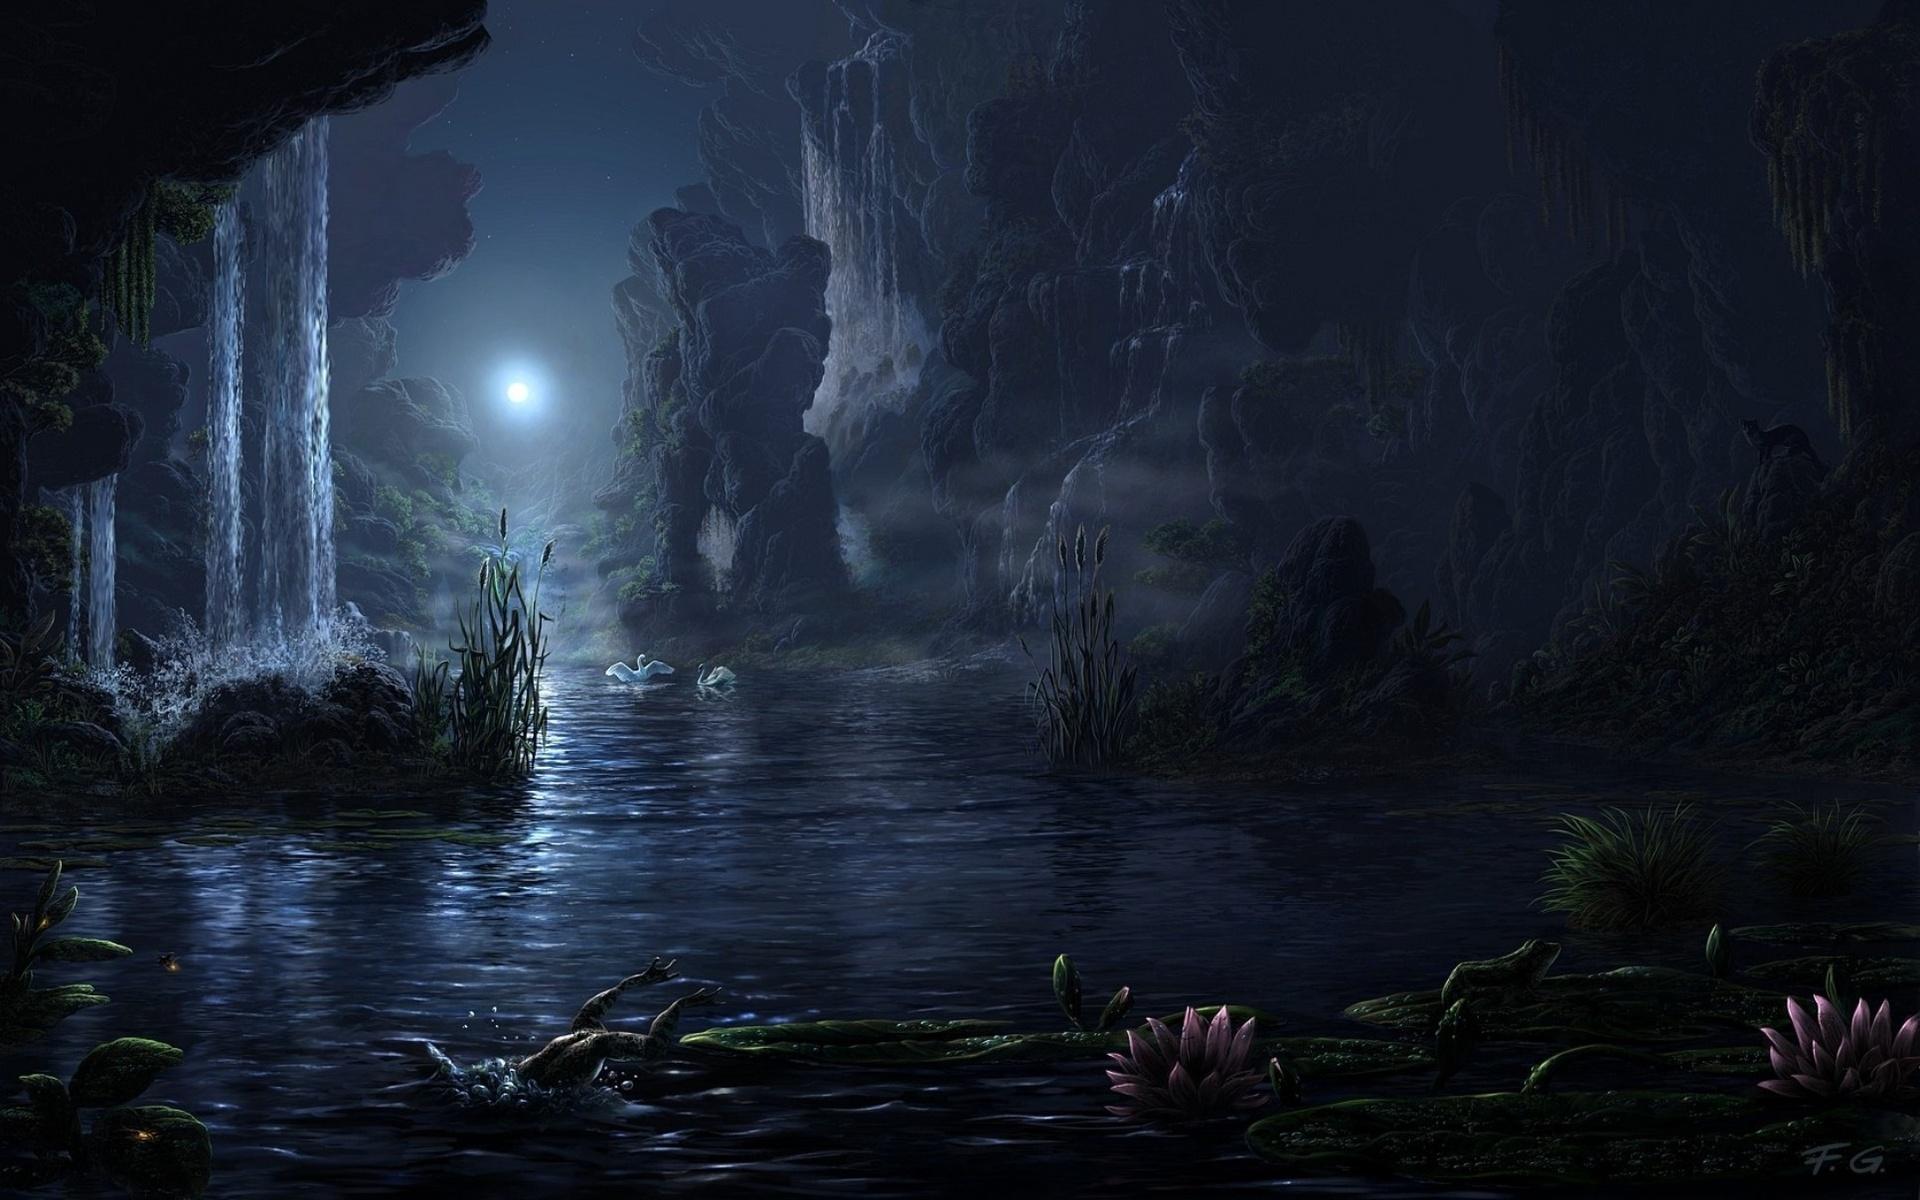 magical fantasy landscapes landscape - photo #8